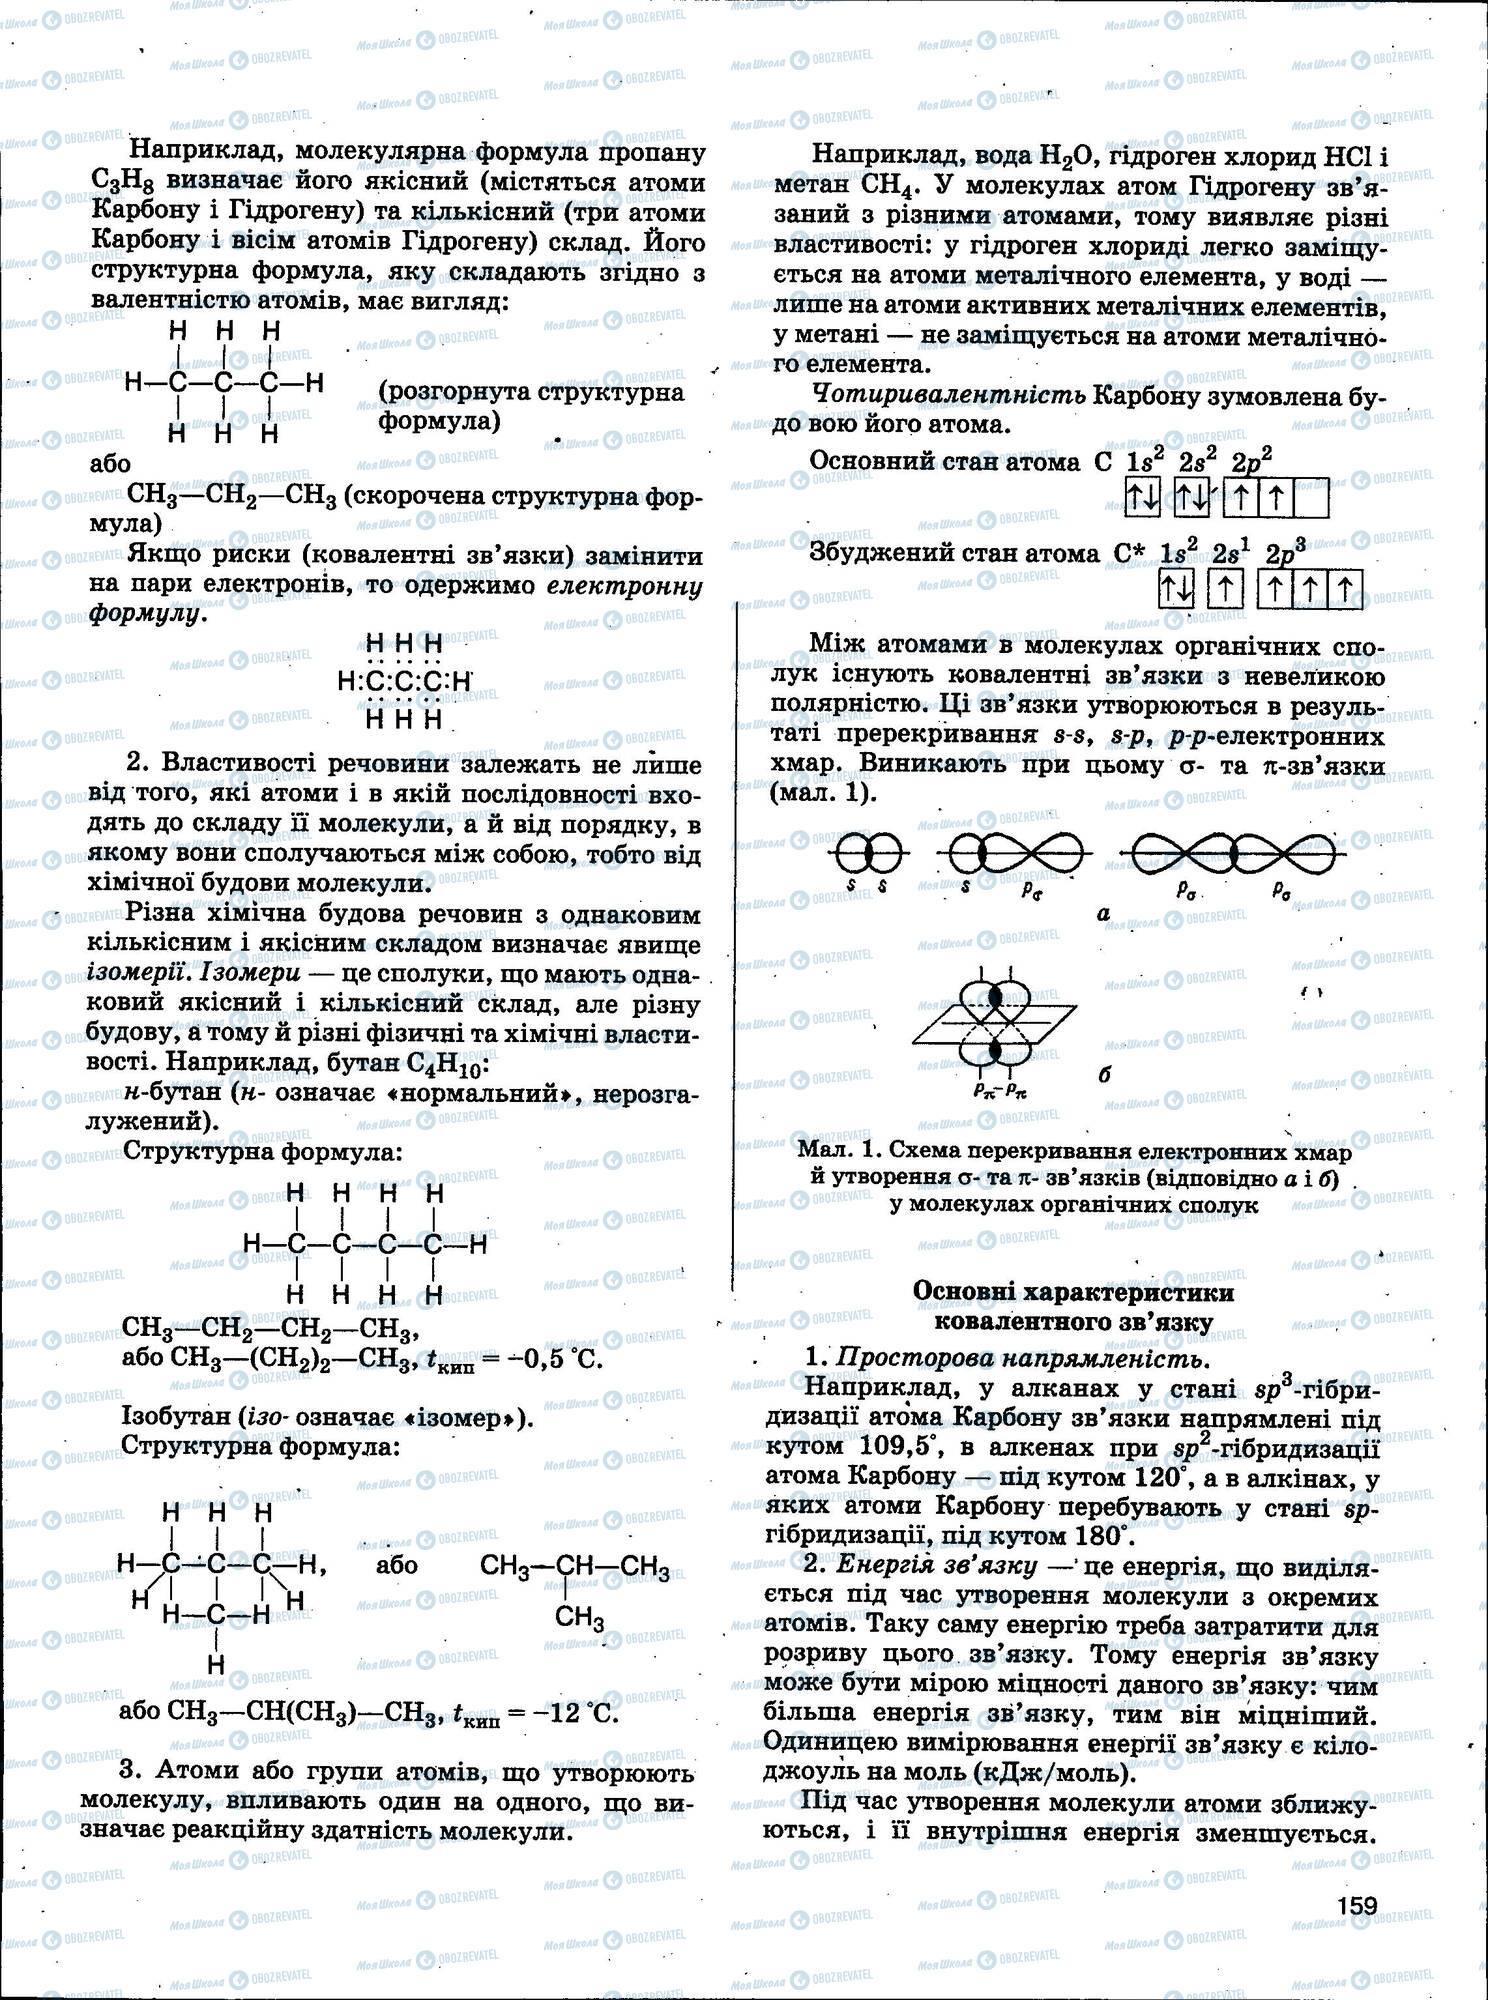 ЗНО Химия 11 класс страница 159